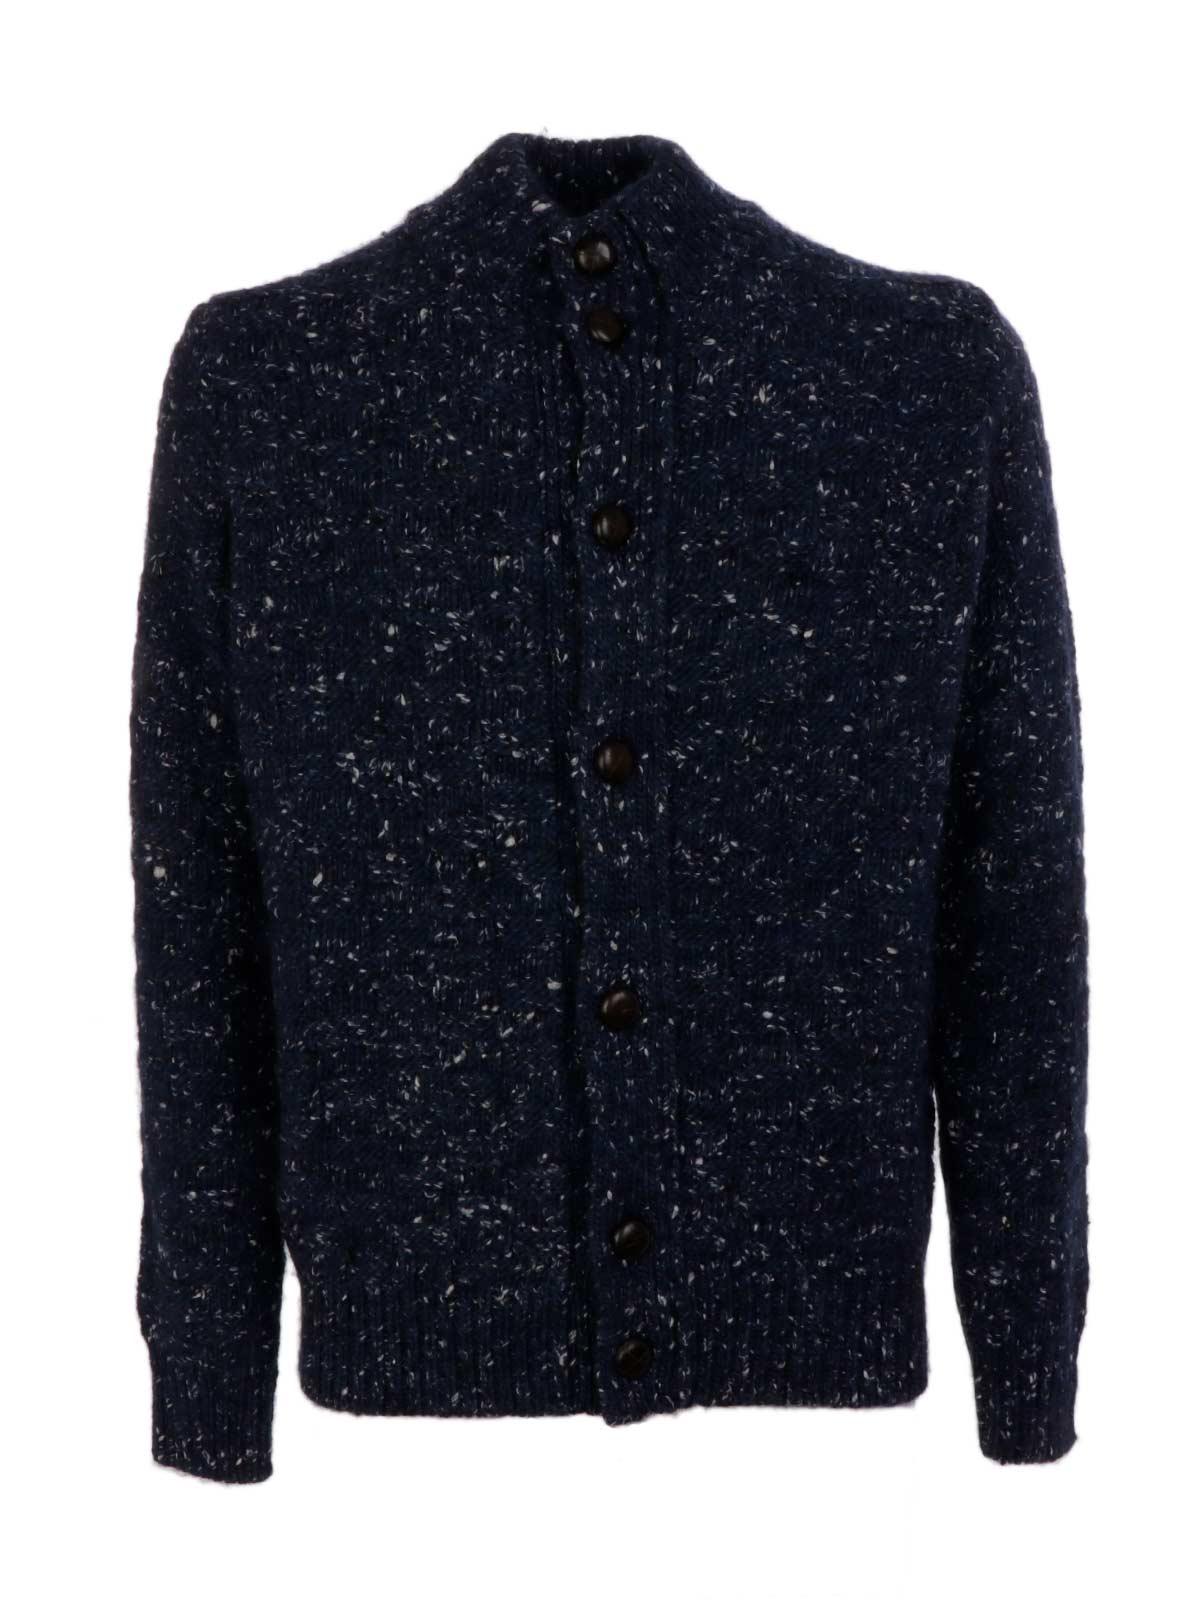 Immagine di ELEVENTY | Cardigan uomo in lana